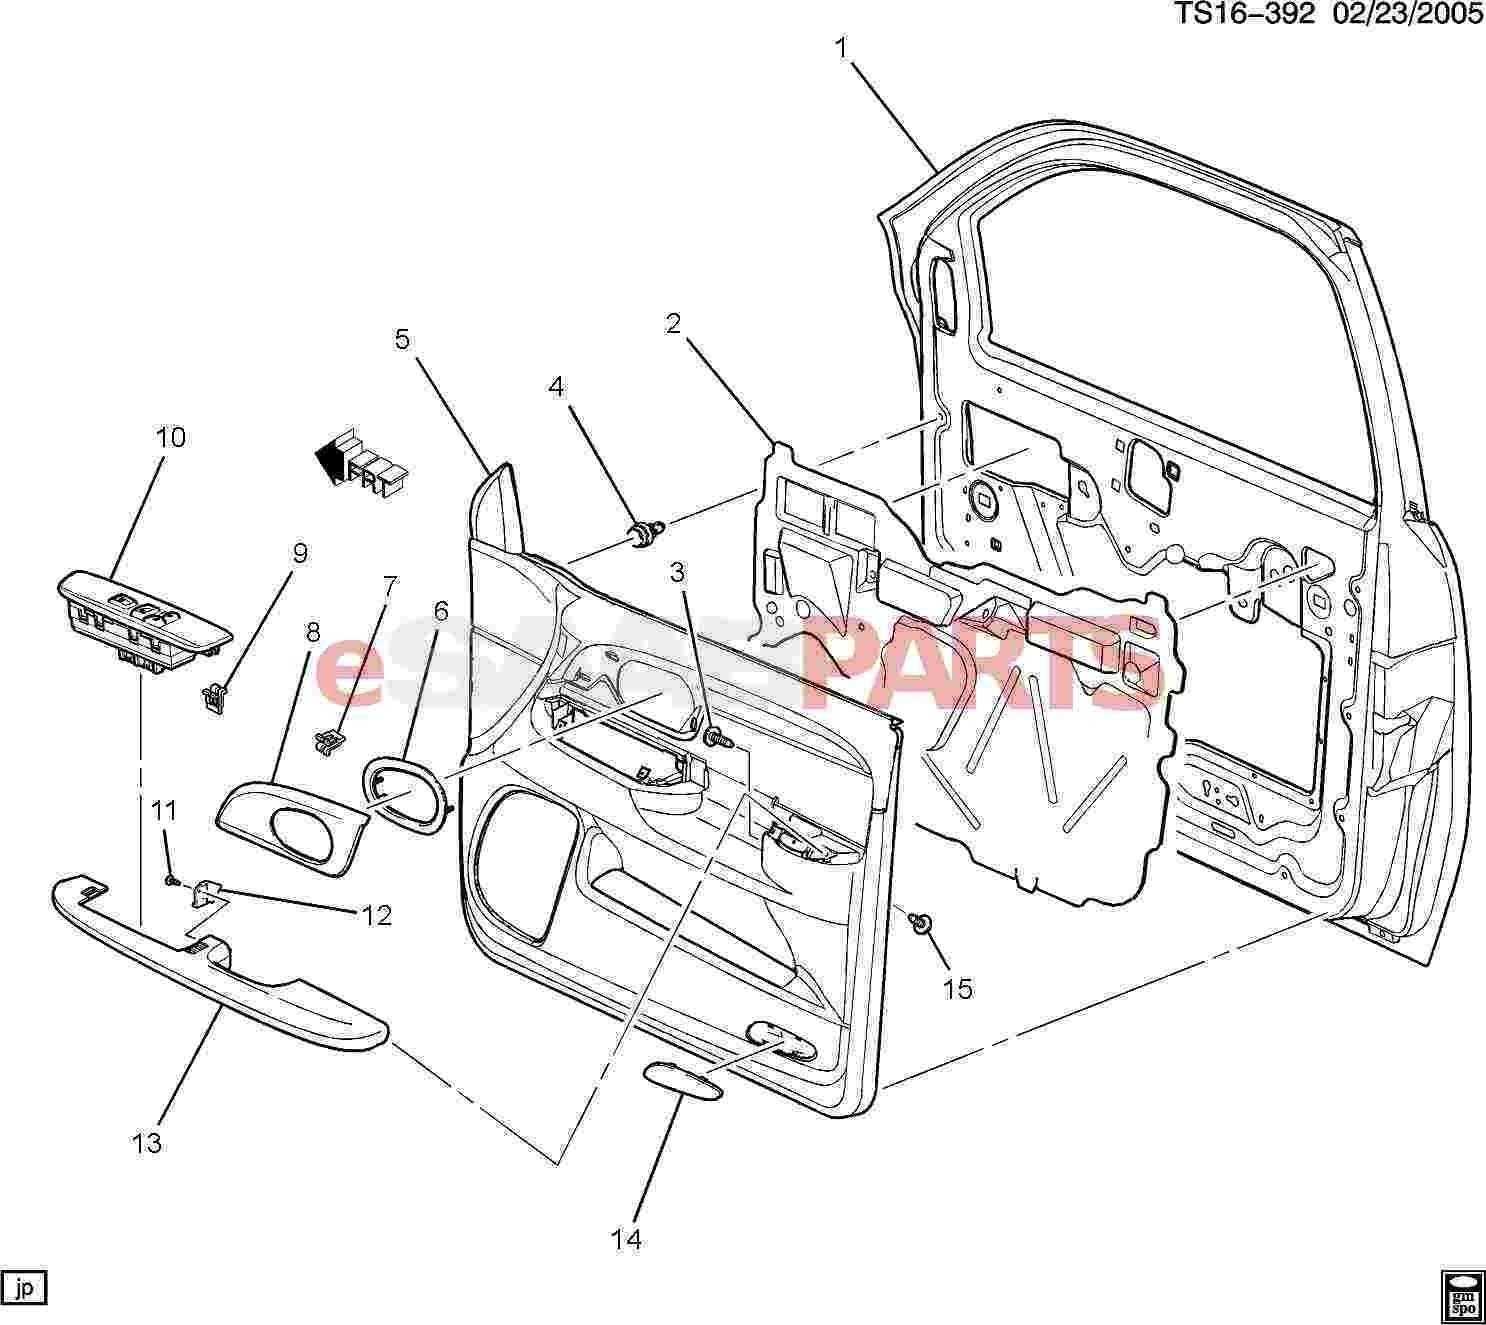 Diagram Of Car Engine Parts ] Saab Bolt Hwh with Fl Wa M4 2×1 41×20 12 5 O D Dog Pt Of Diagram Of Car Engine Parts